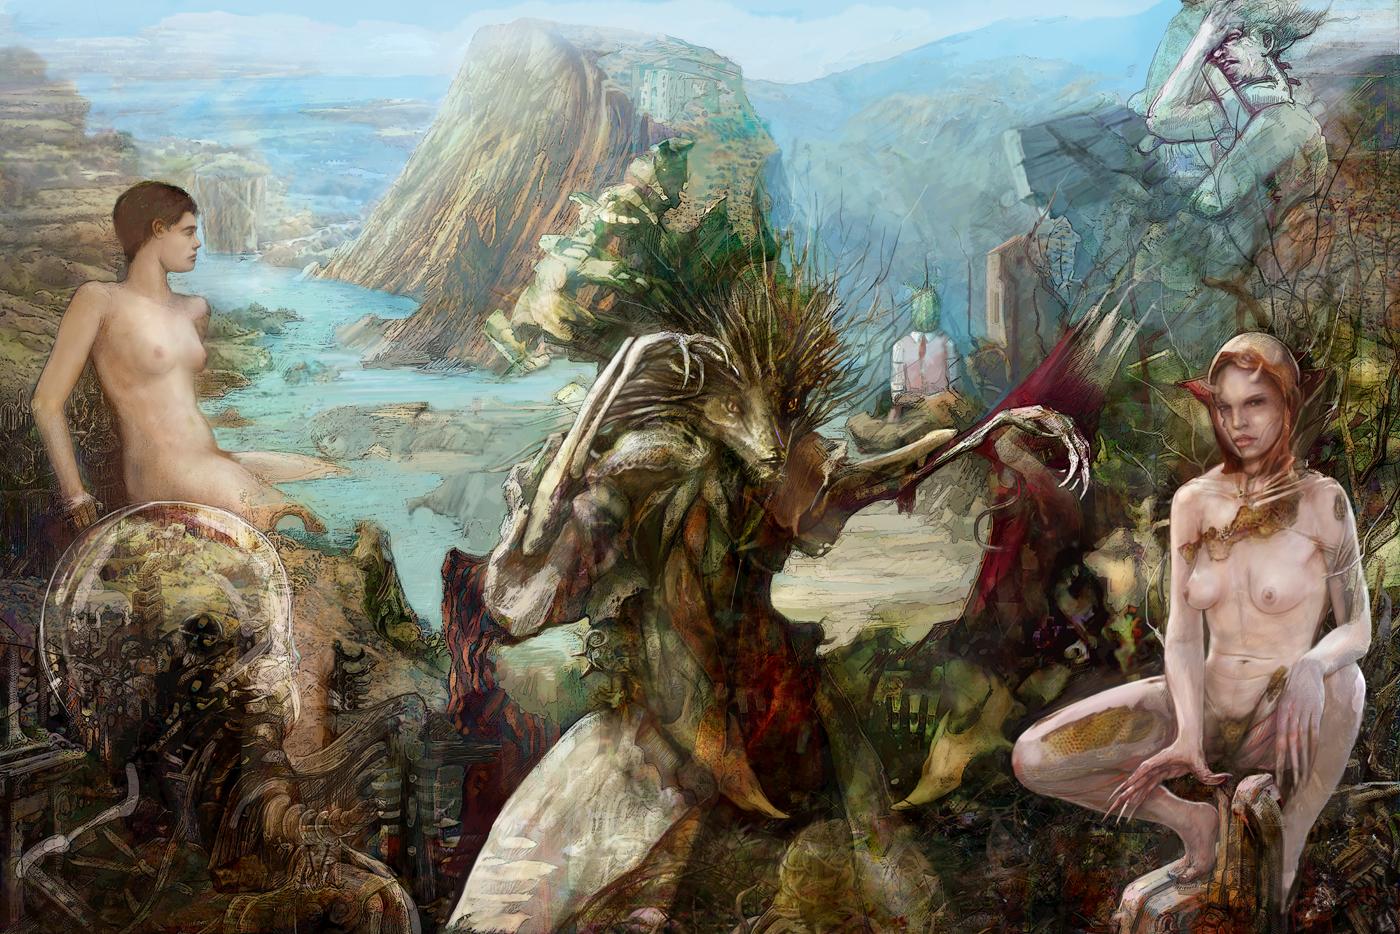 Witchworld by Flockhart